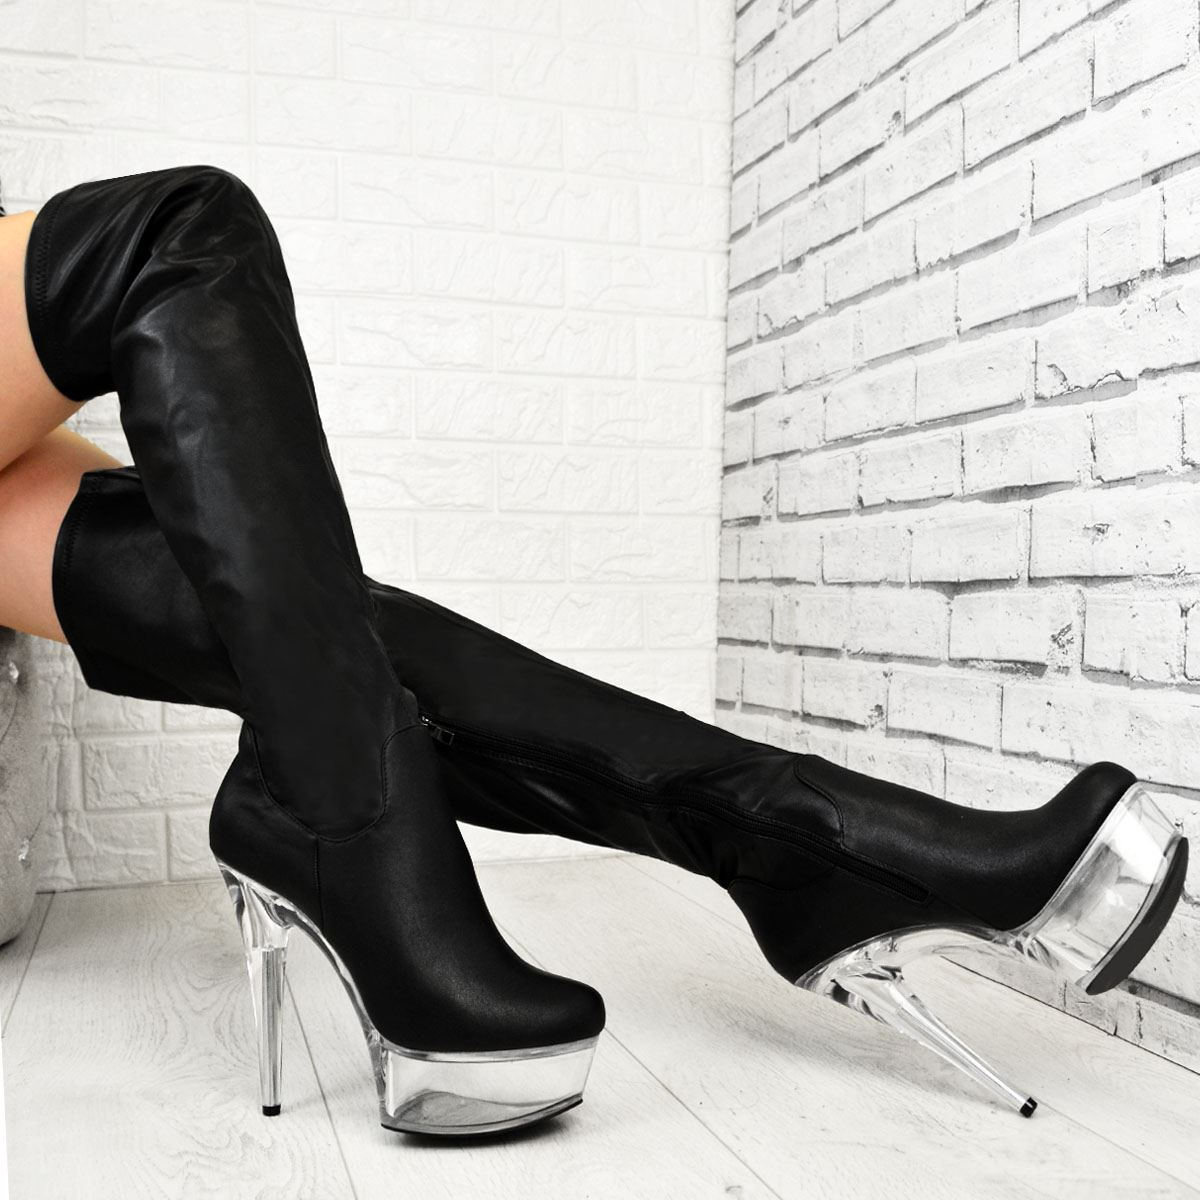 Details about  /Women Over The Knee Stretch Stripper Perspex Platform High Heels Boots Dancing D